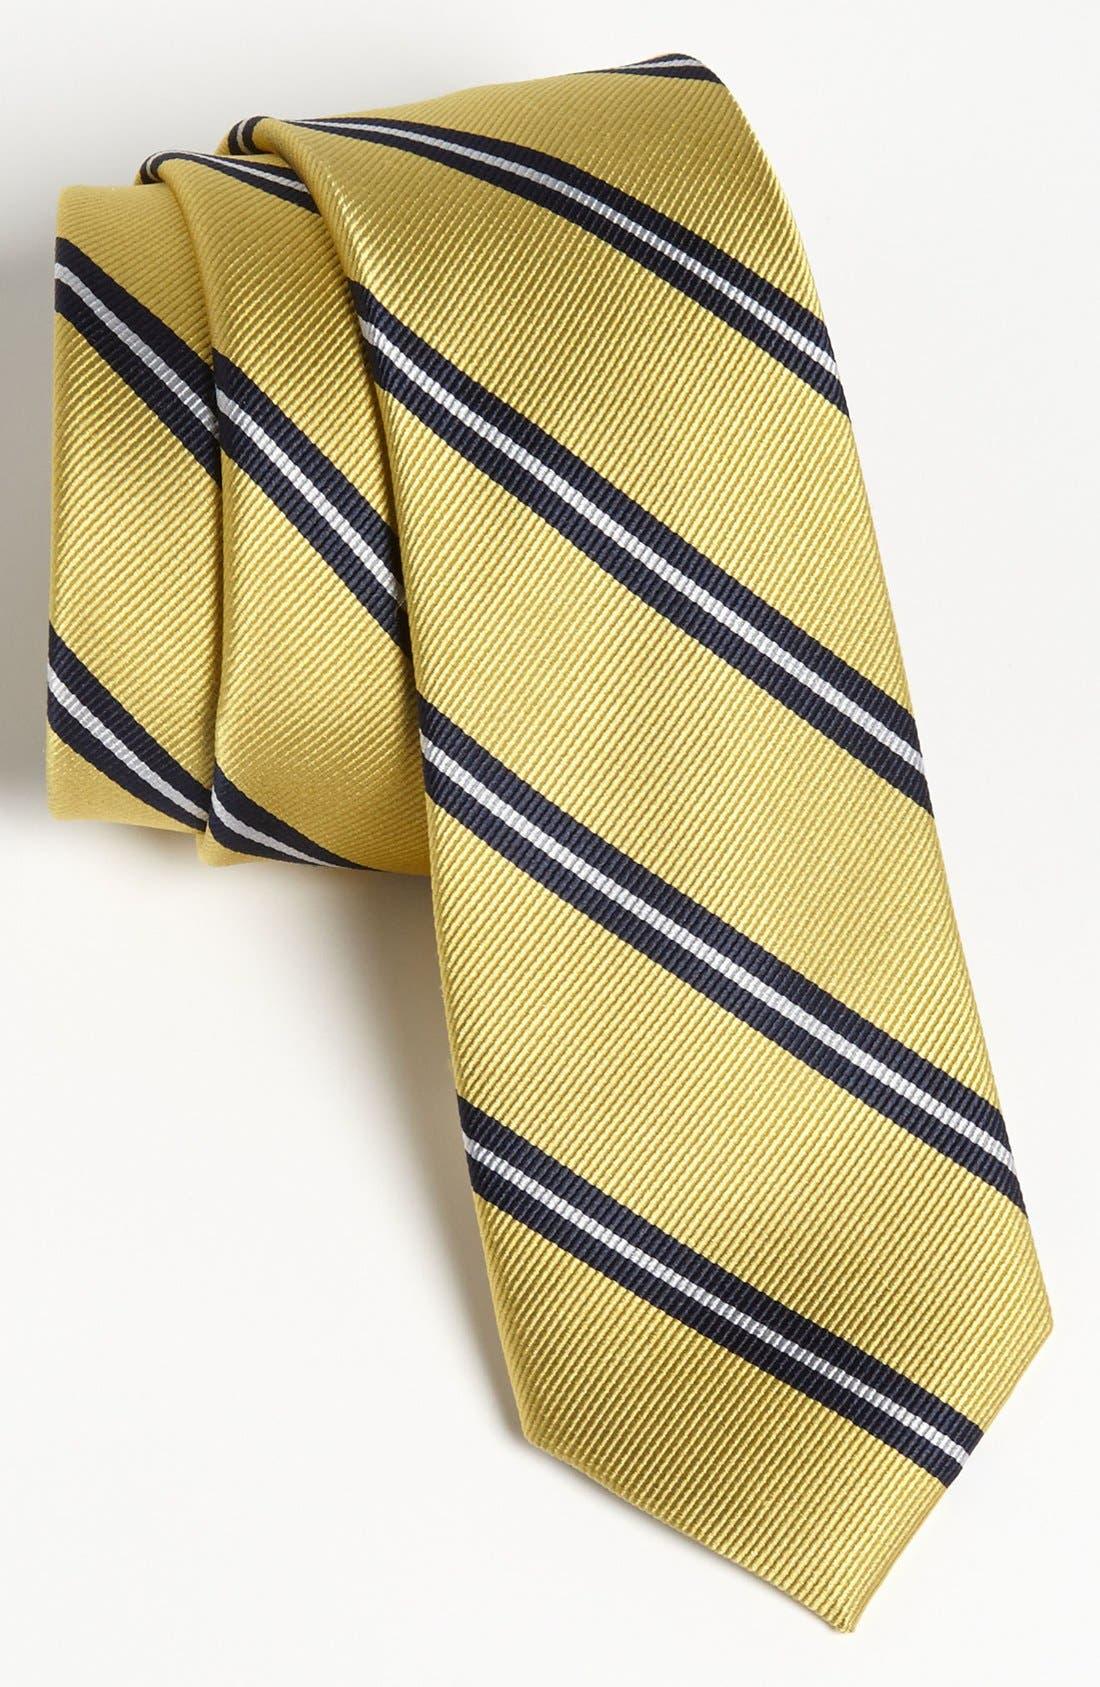 Main Image - 1901 Woven Silk Tie